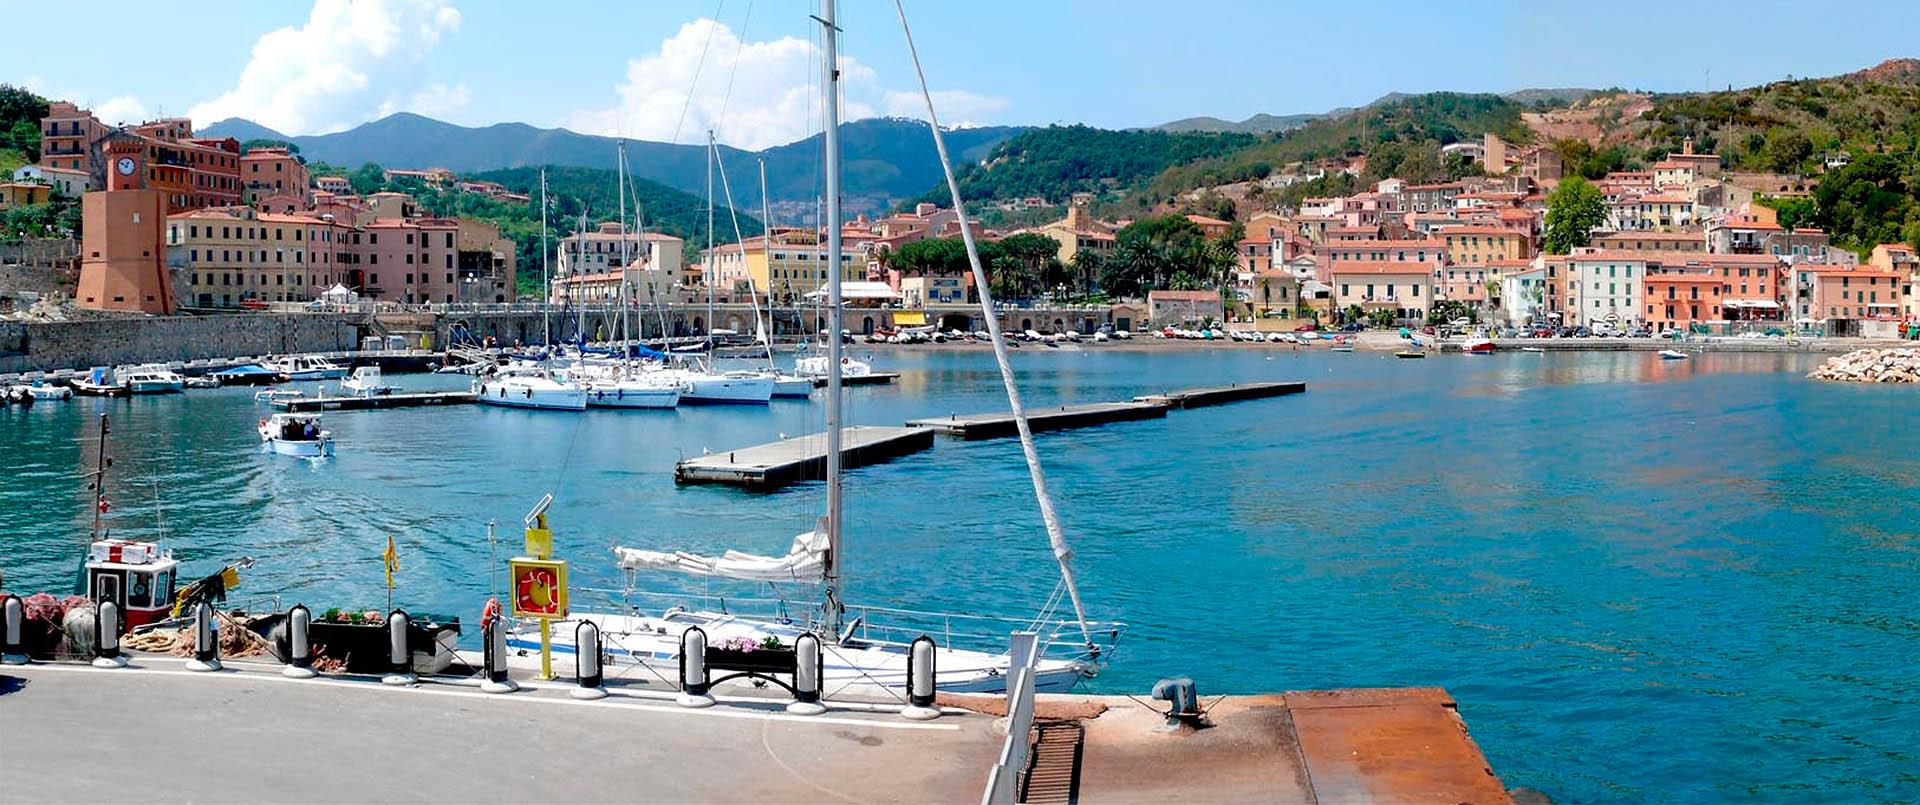 Cantiere Navale Rio Marina